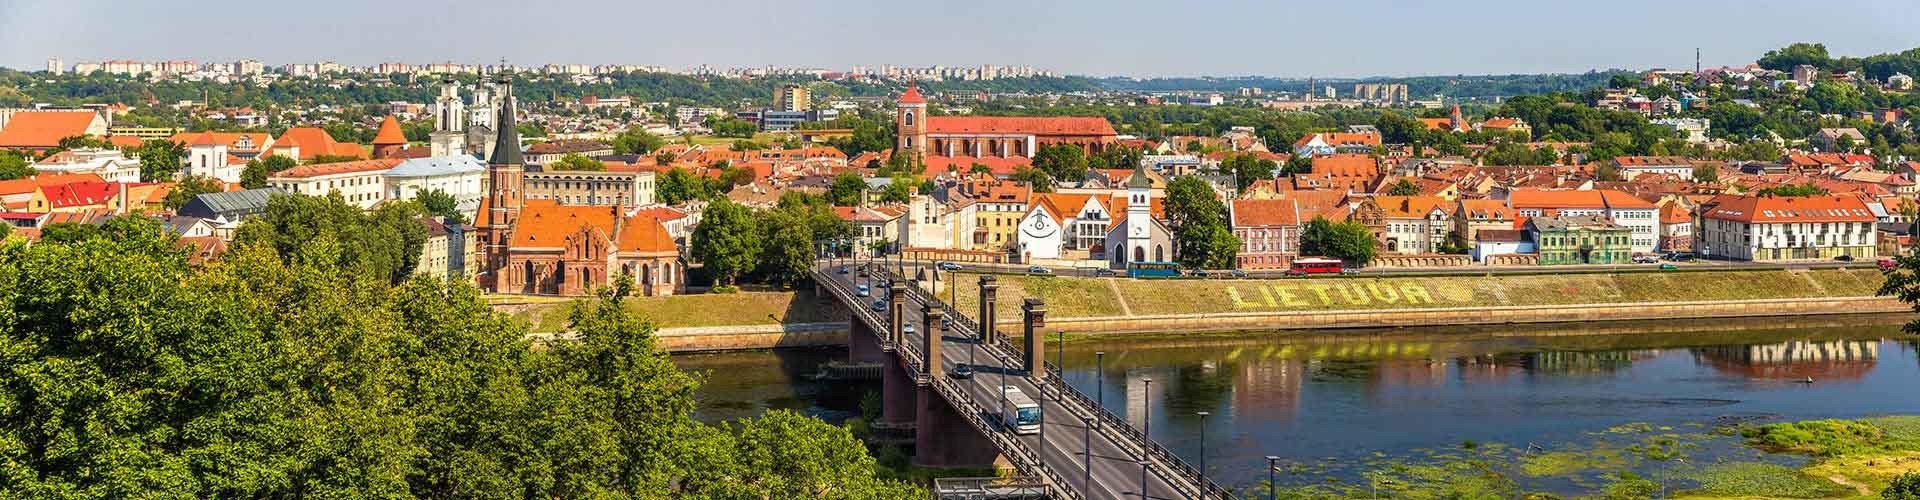 Experiencia en Kaunas, Liruana, por Kamilė